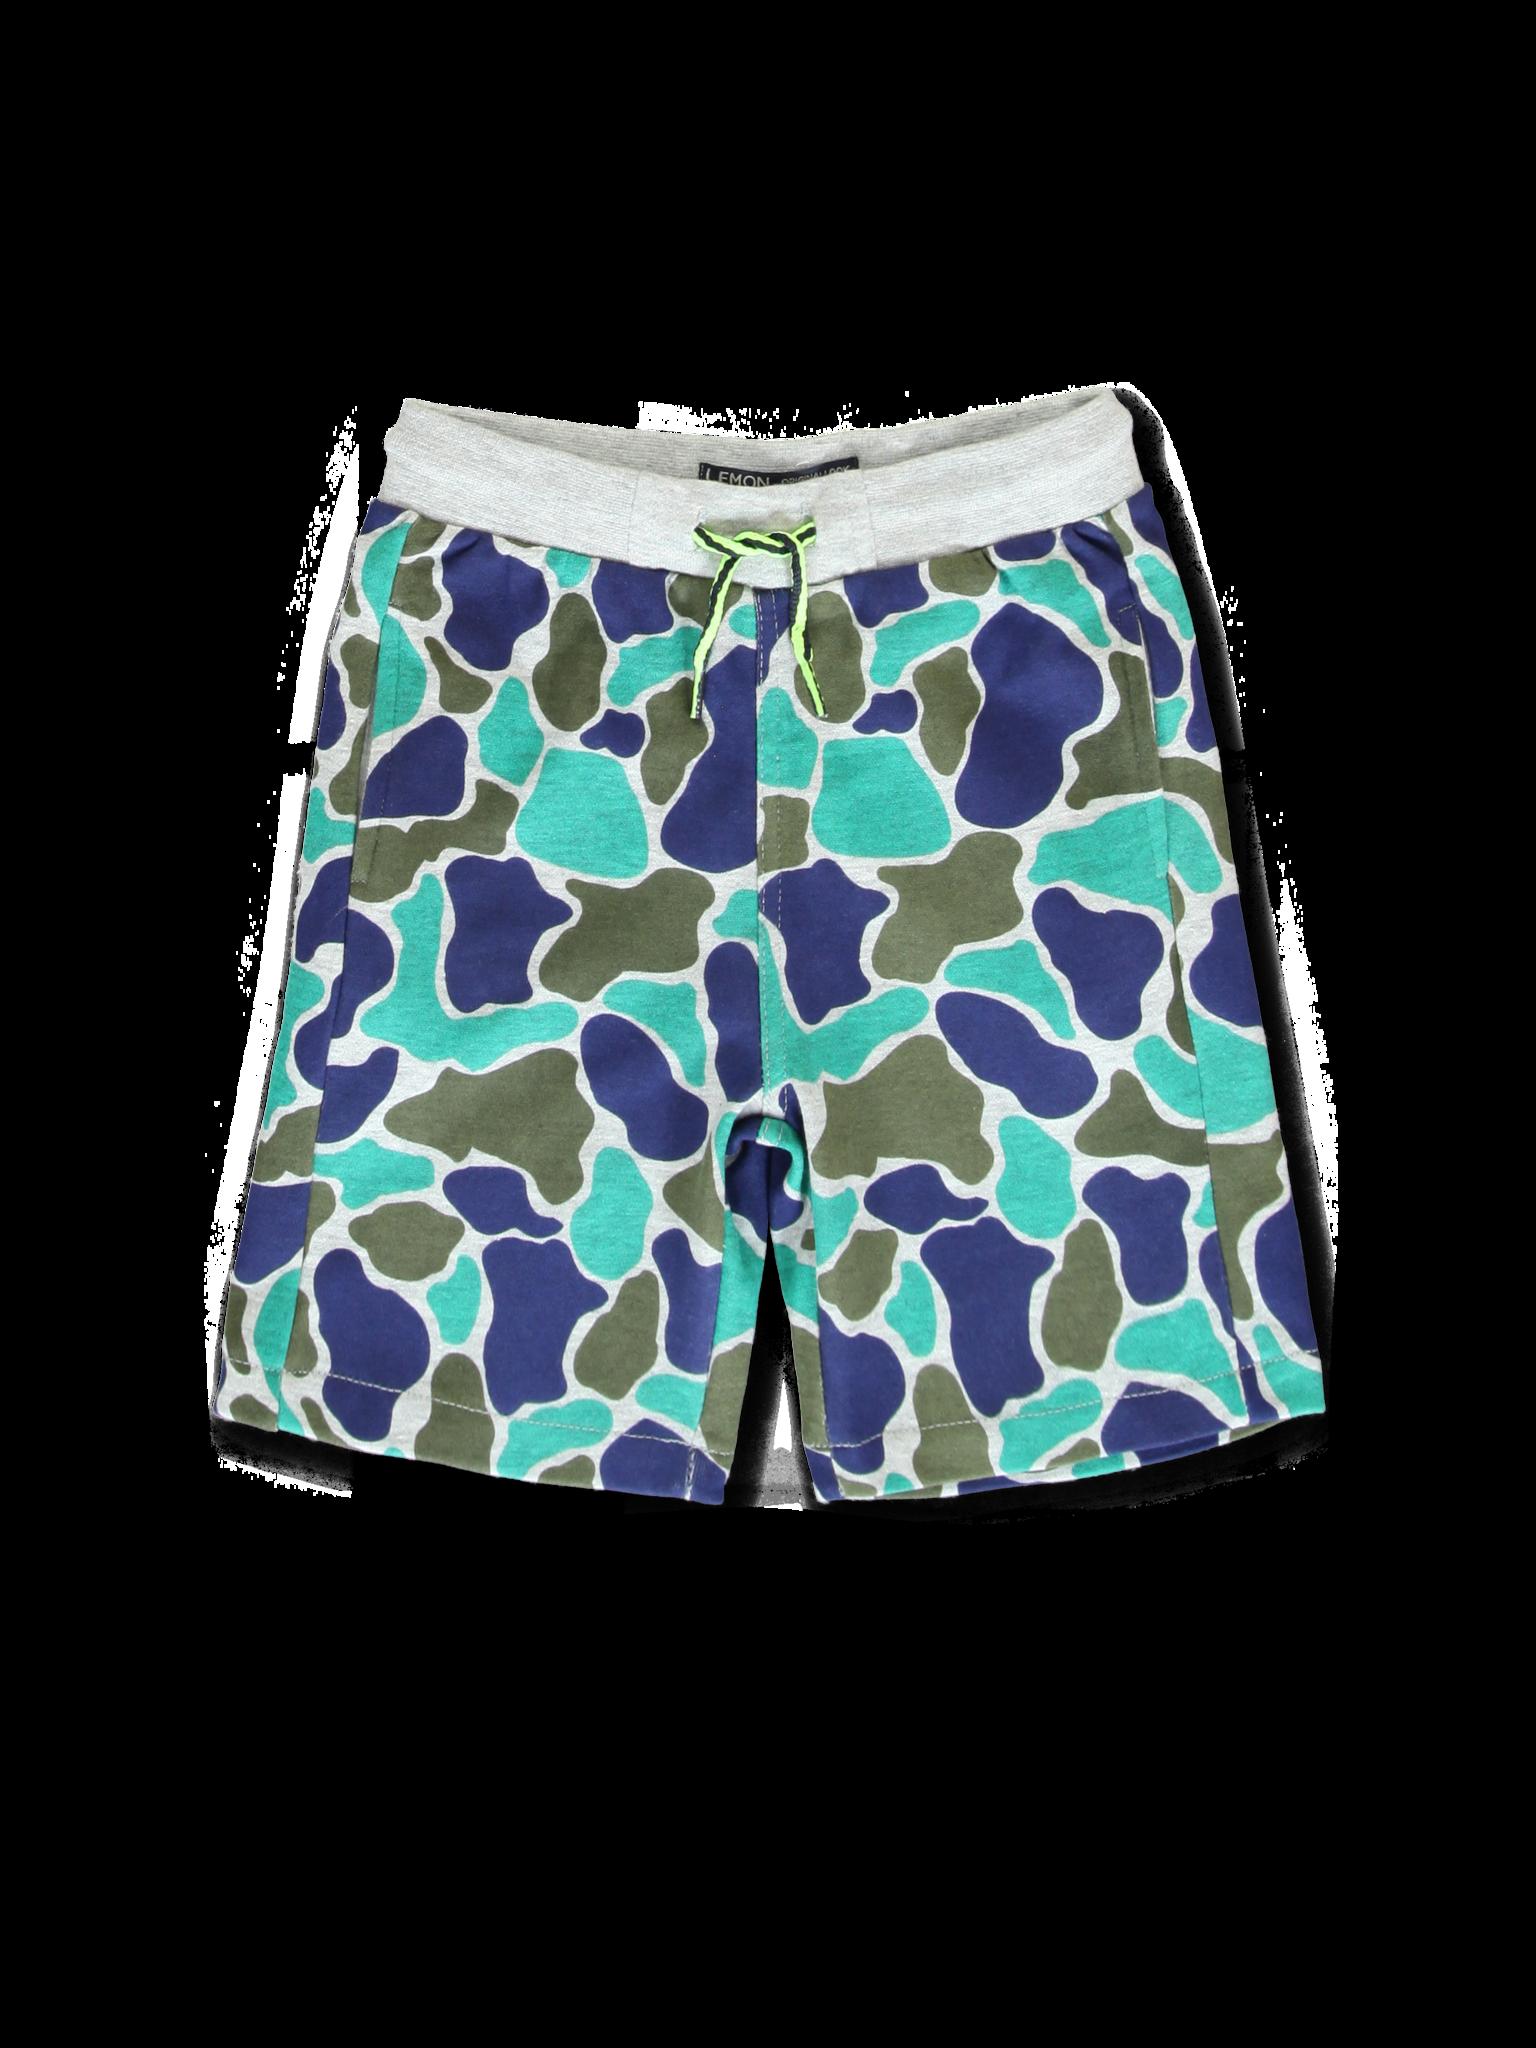 All Brands | Summerproducts Small Boys | Bermuda | 12 pcs/box